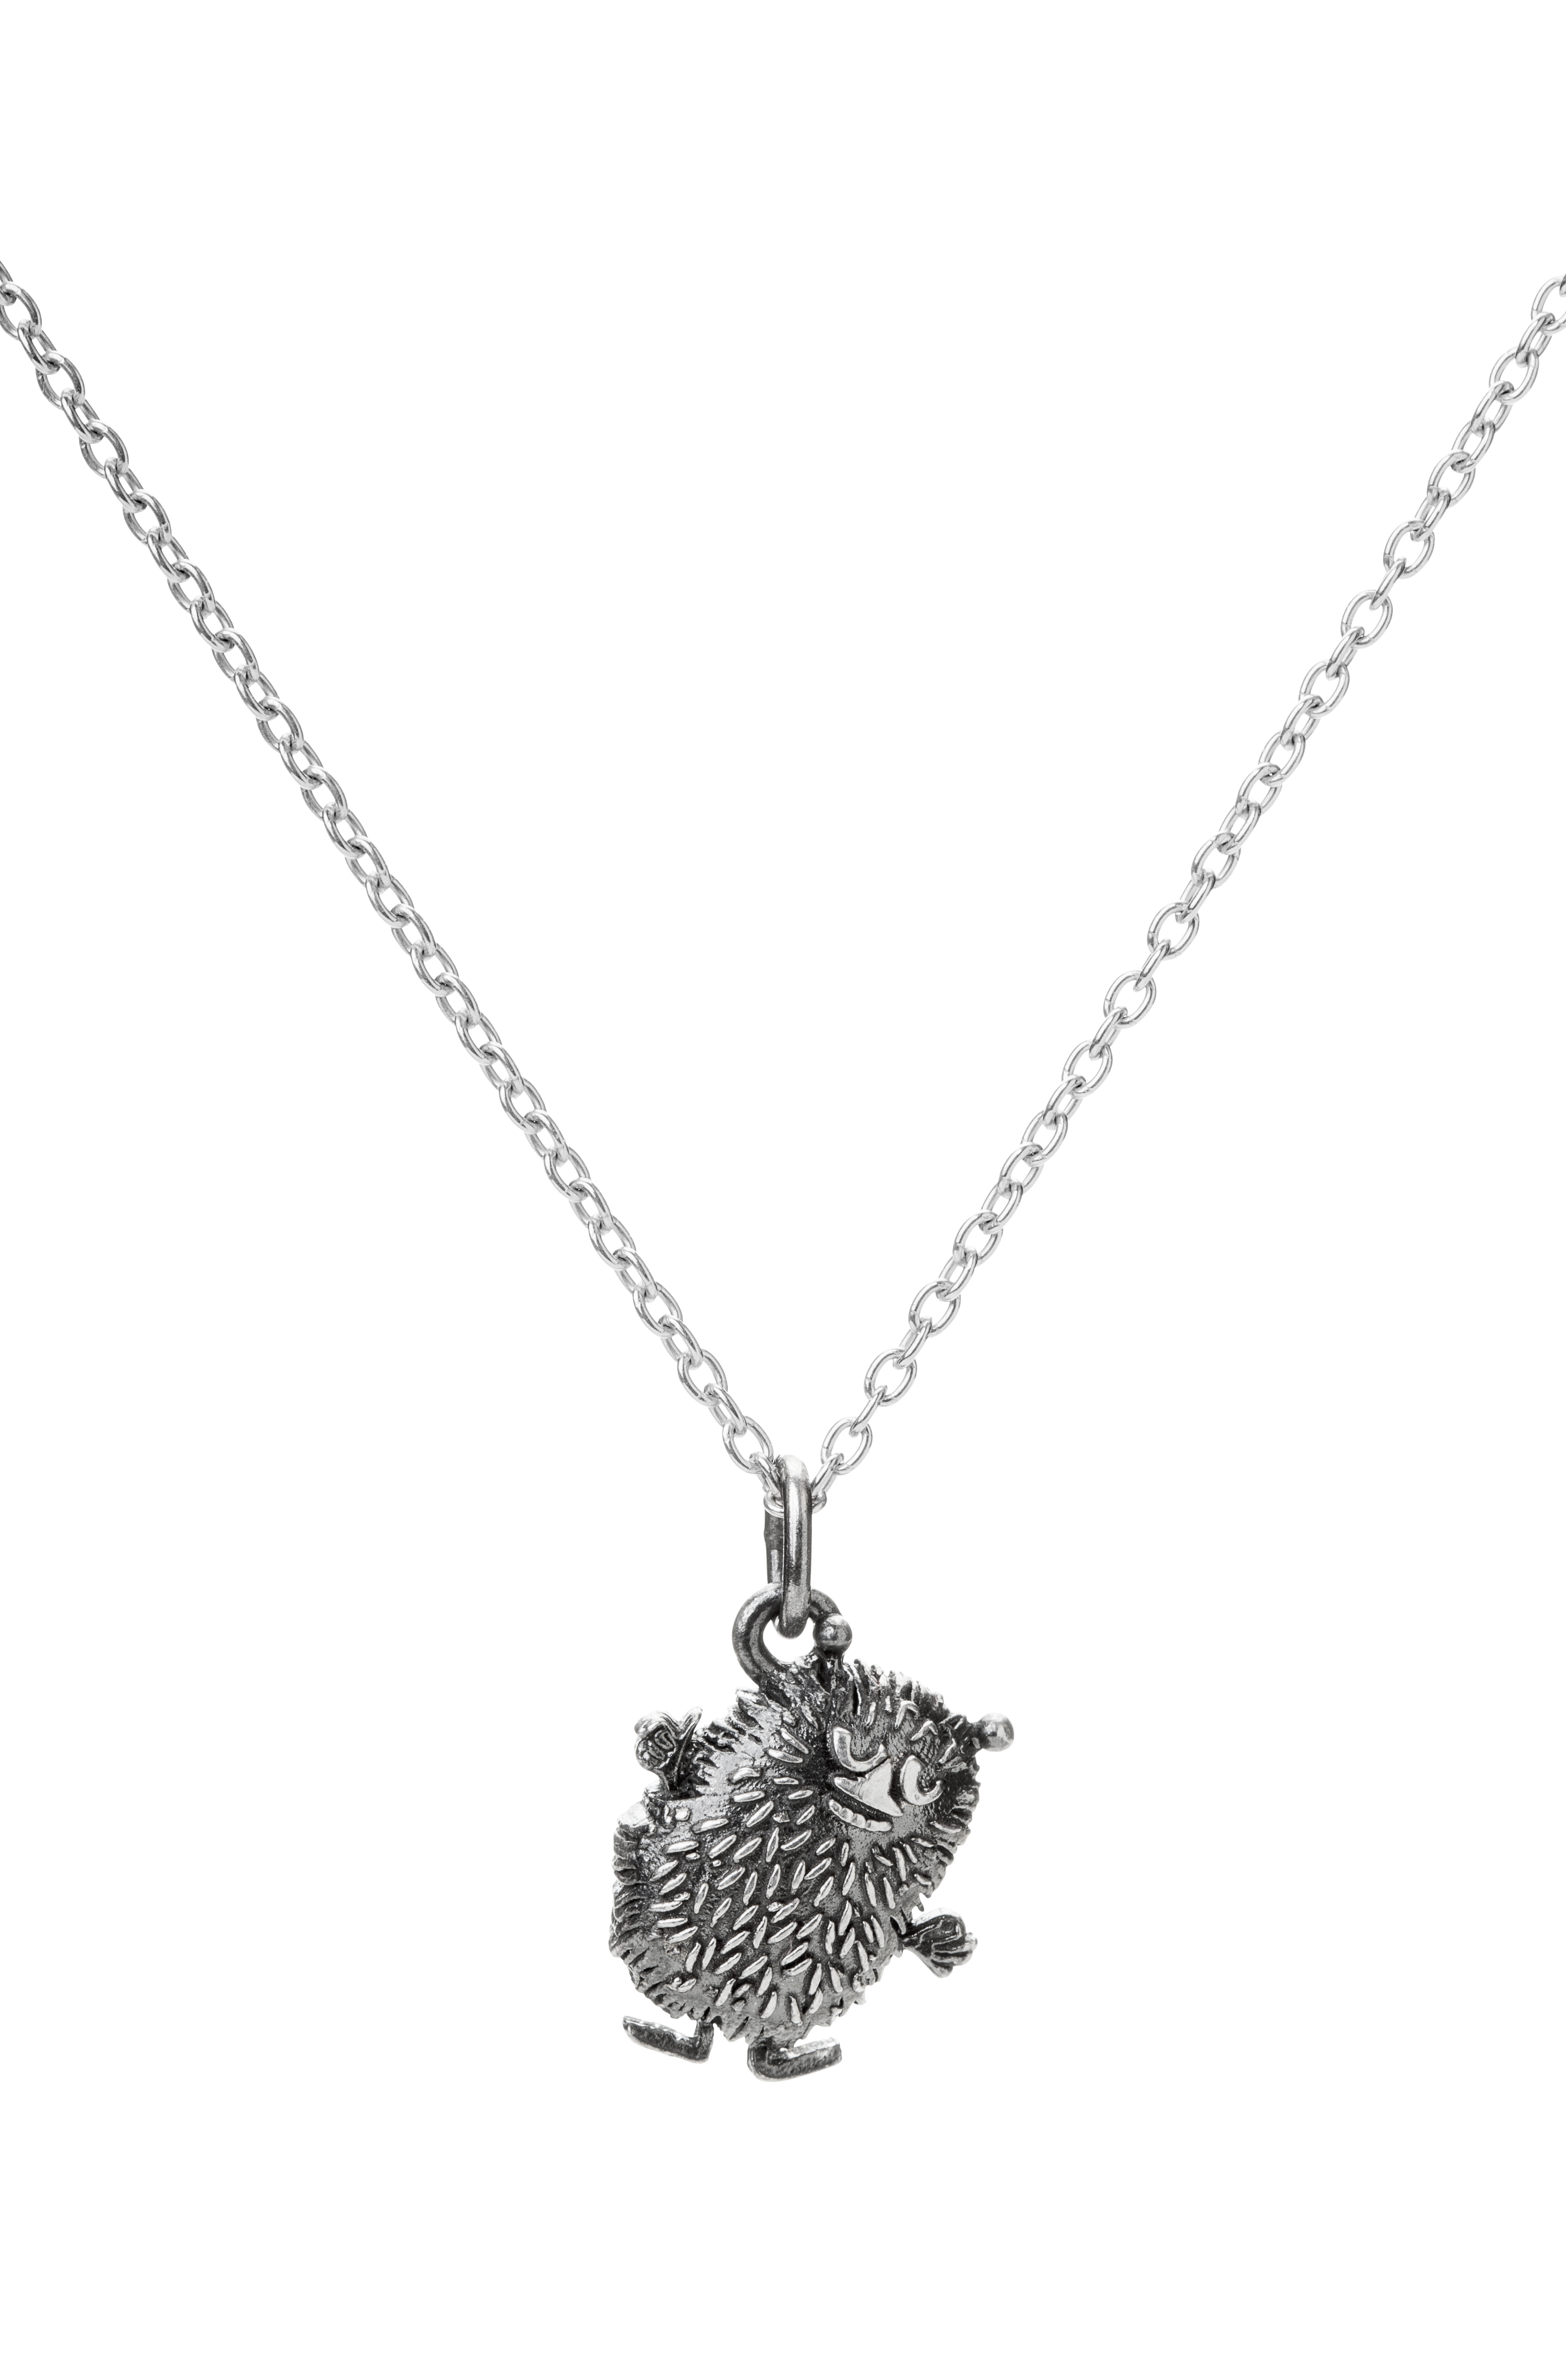 Saurum Stinky silver pendant